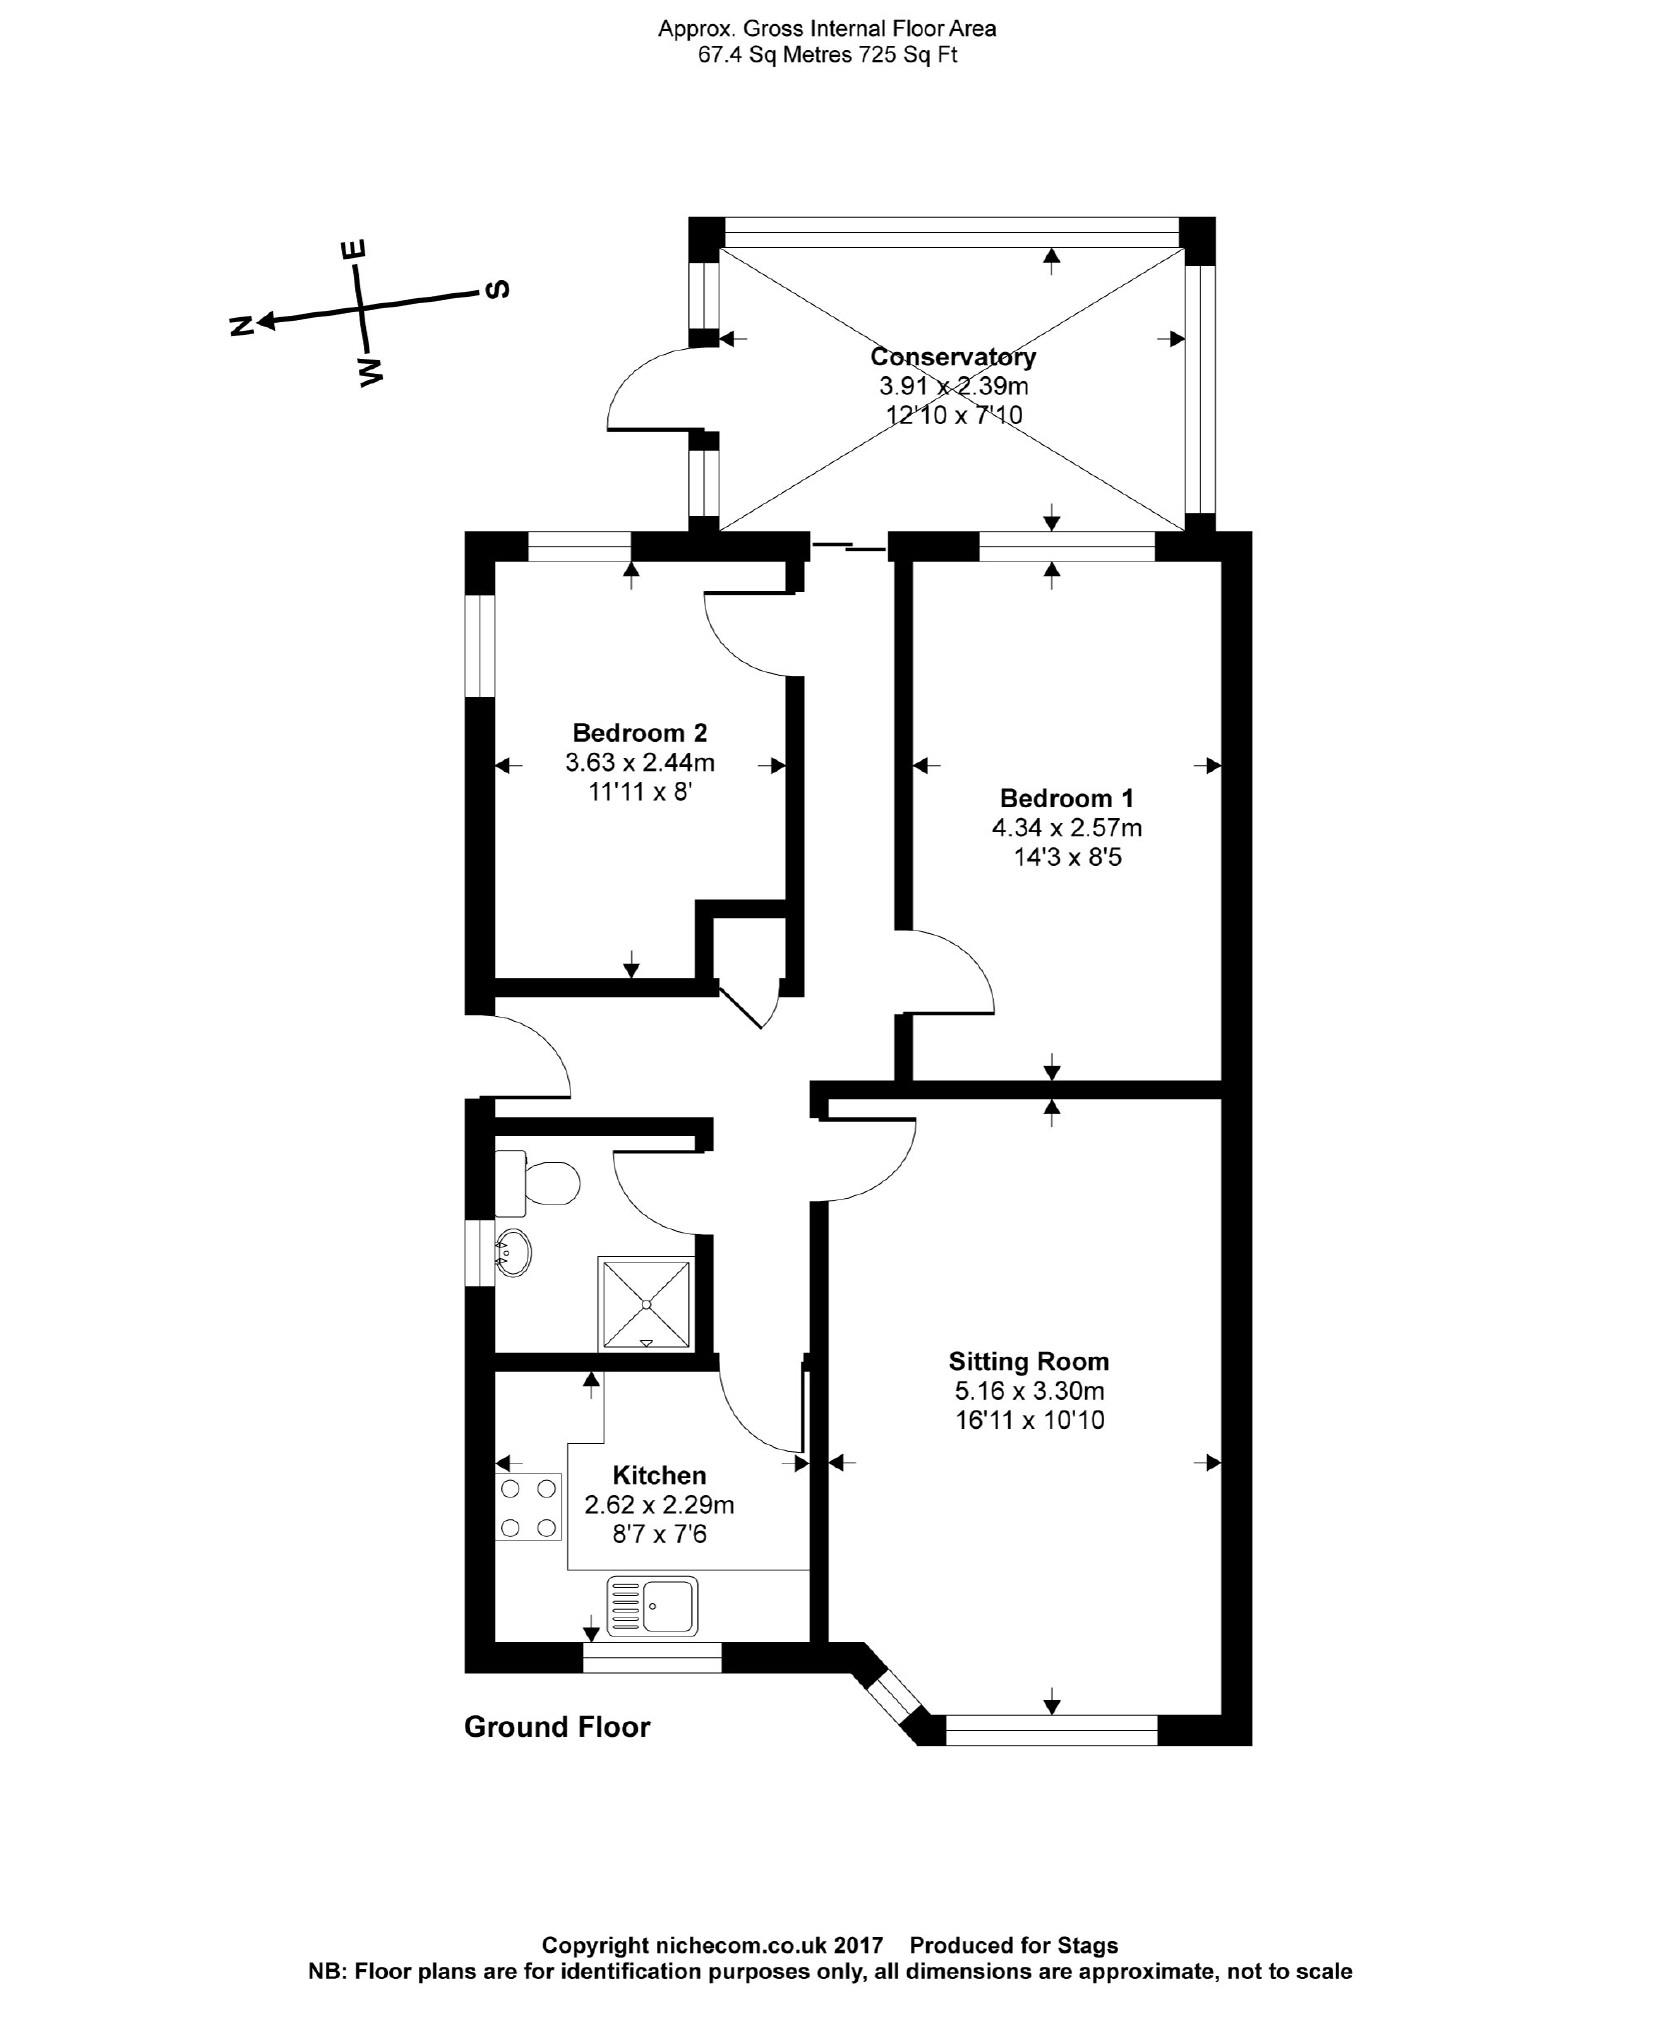 Fx floor plan 28 images formula 350 fx cbr 2016 2016 for Design homes inc reviews